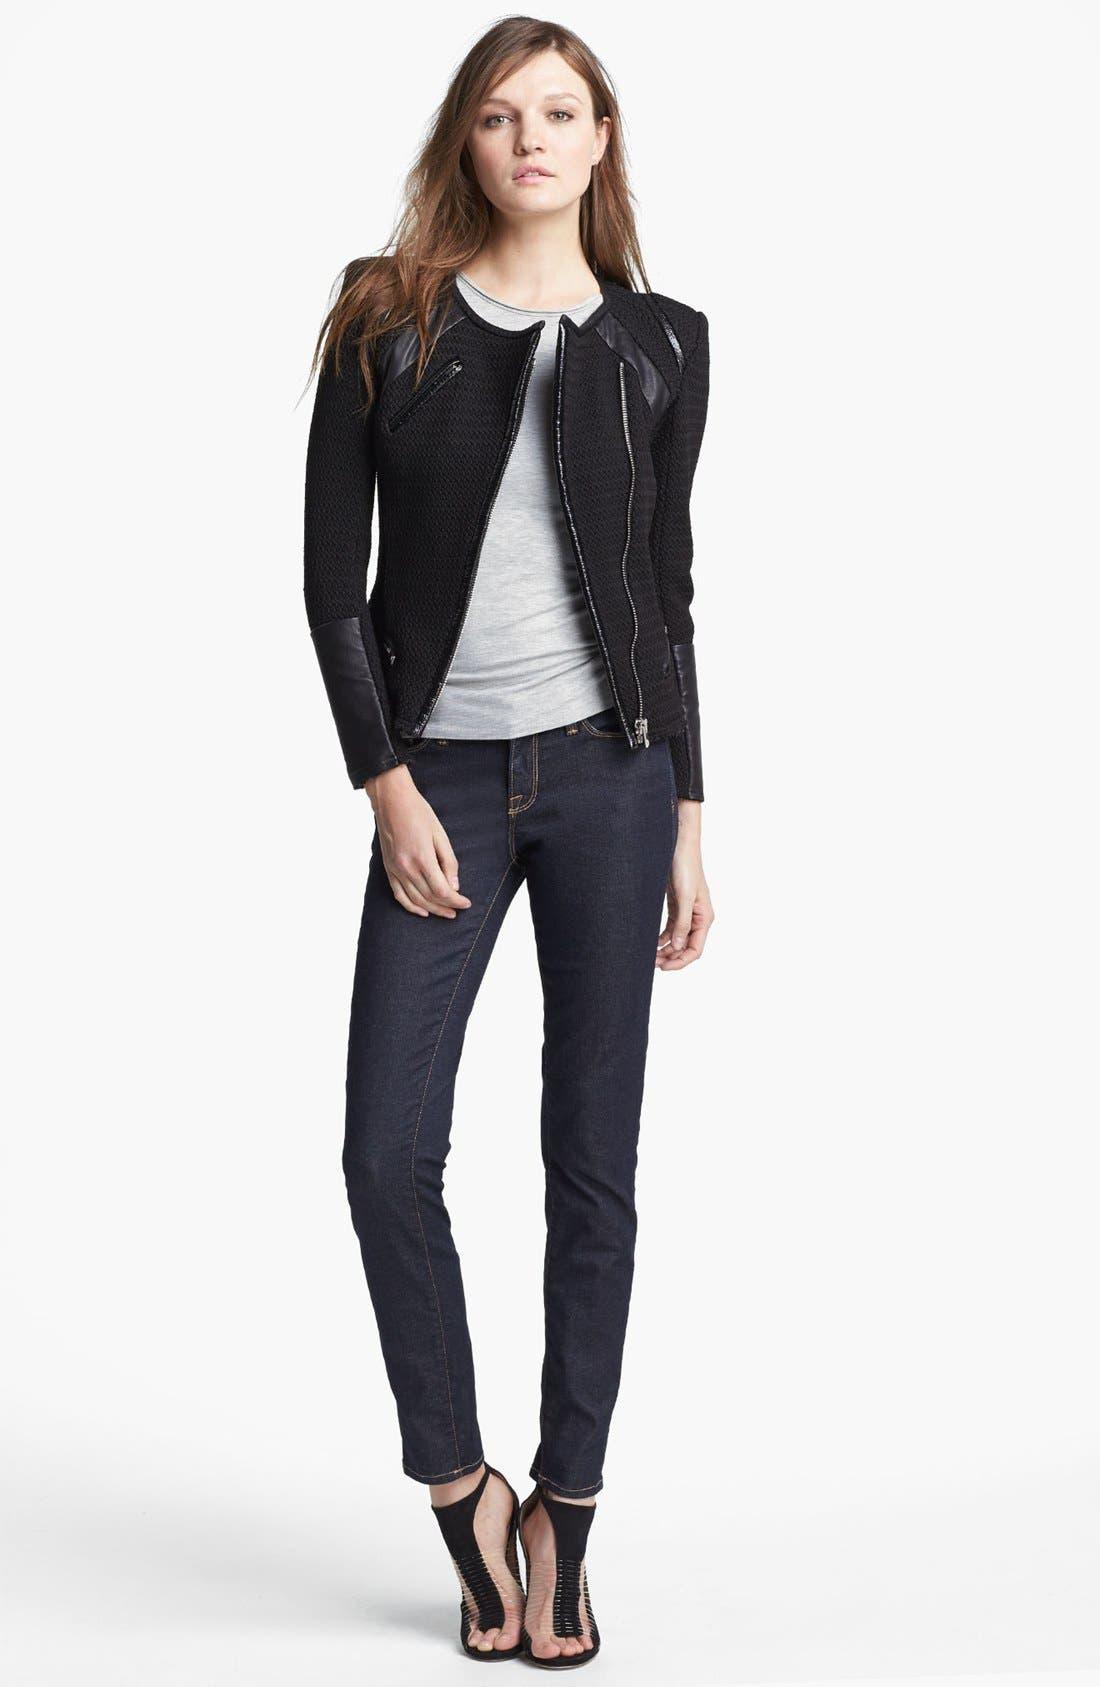 Alternate Image 1 Selected - IRO 'Risley' Asymmetrical Leather Trim Jacket